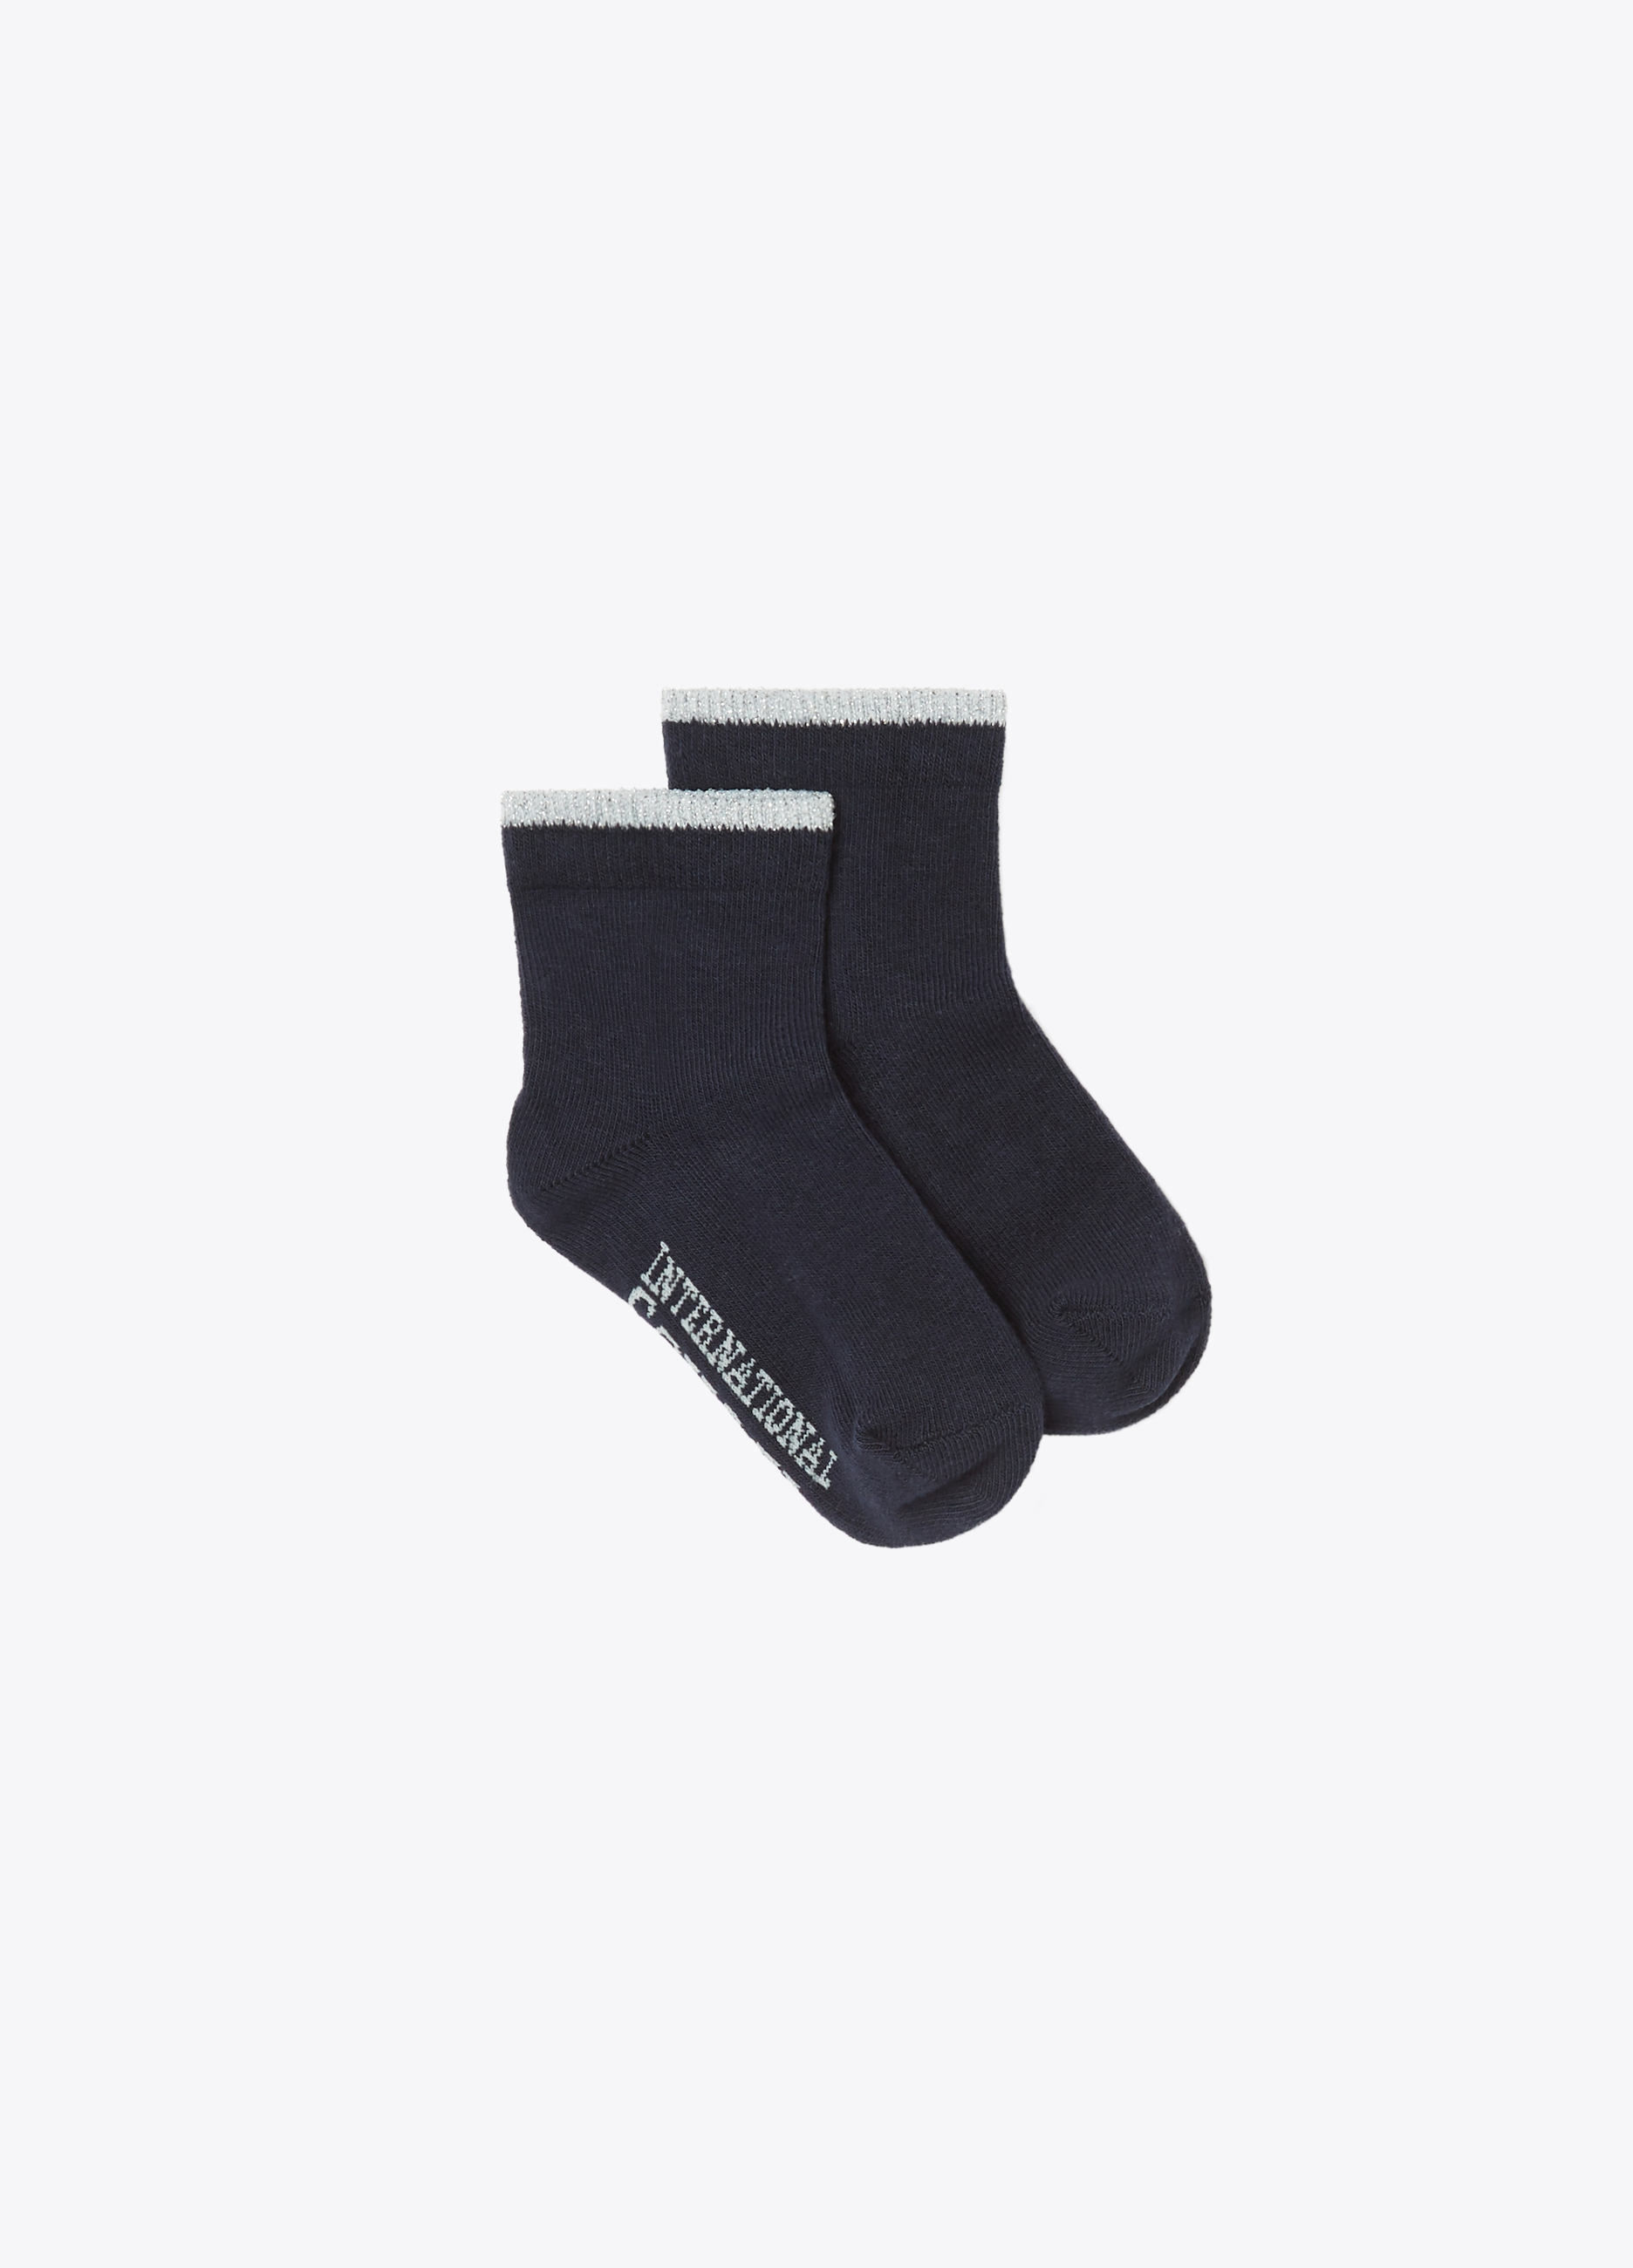 Short stretch socks with lurex